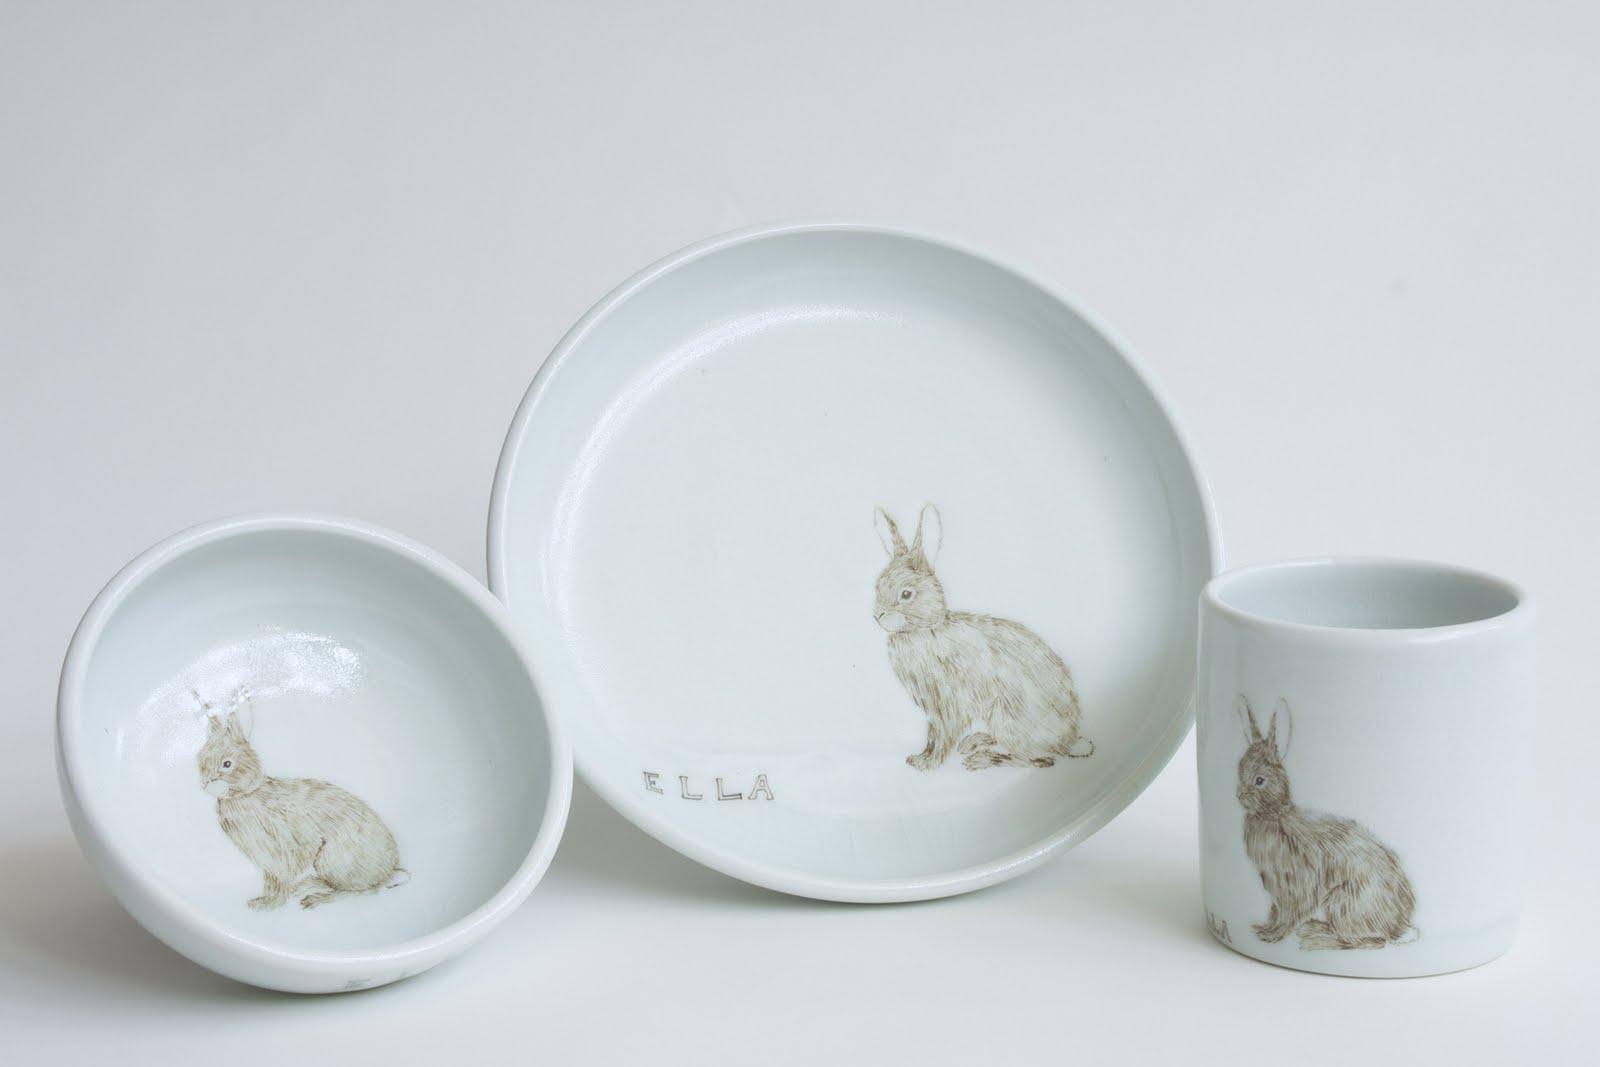 Porcelain Plates Sets & Ceramic Plate Set Popular 30pcs ...